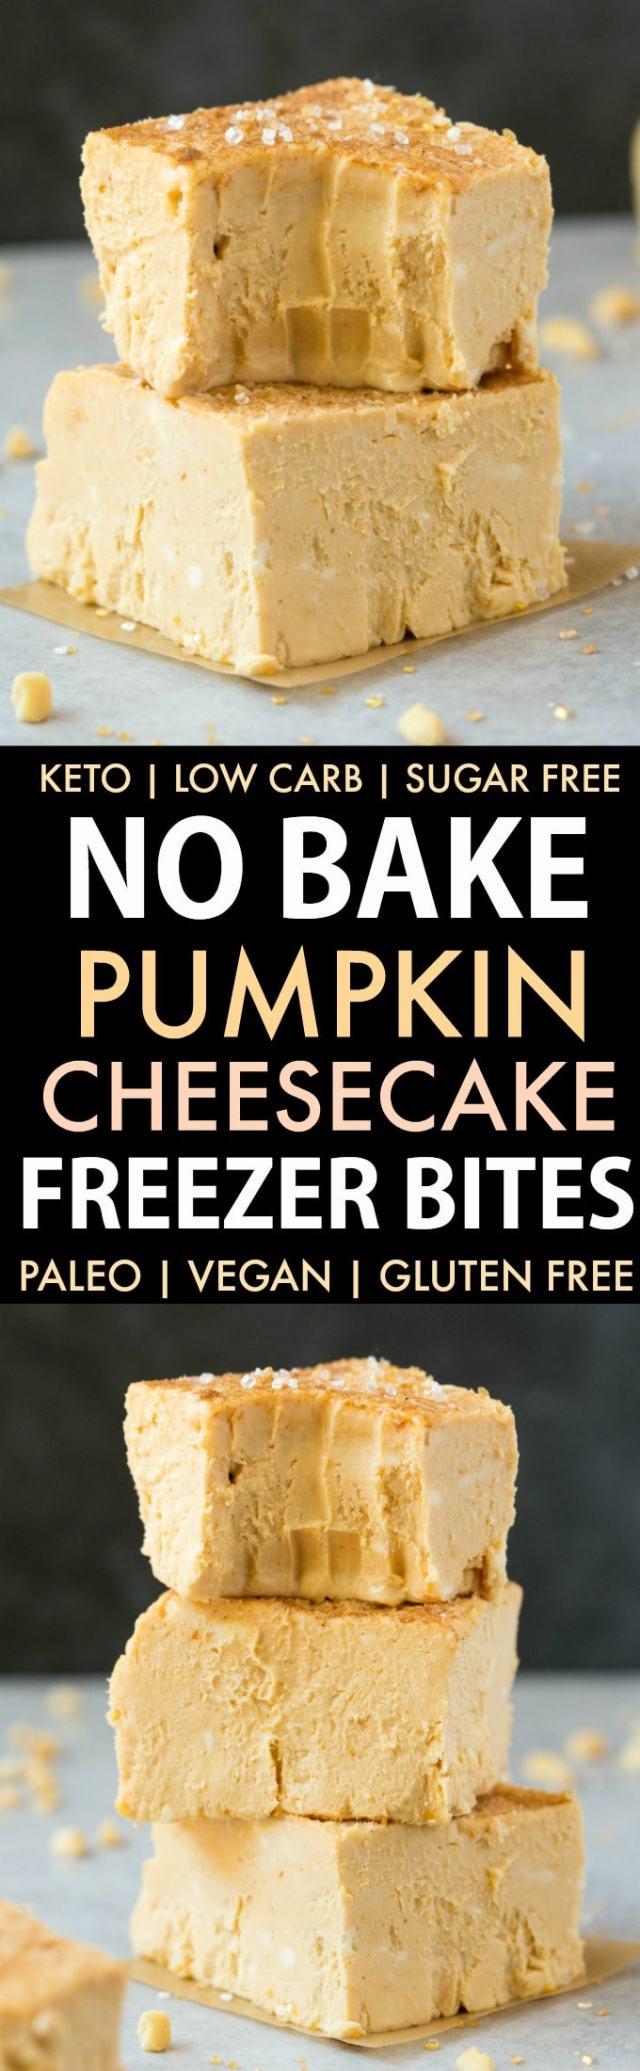 No Bake Pumpkin Cheesecake Bites collage